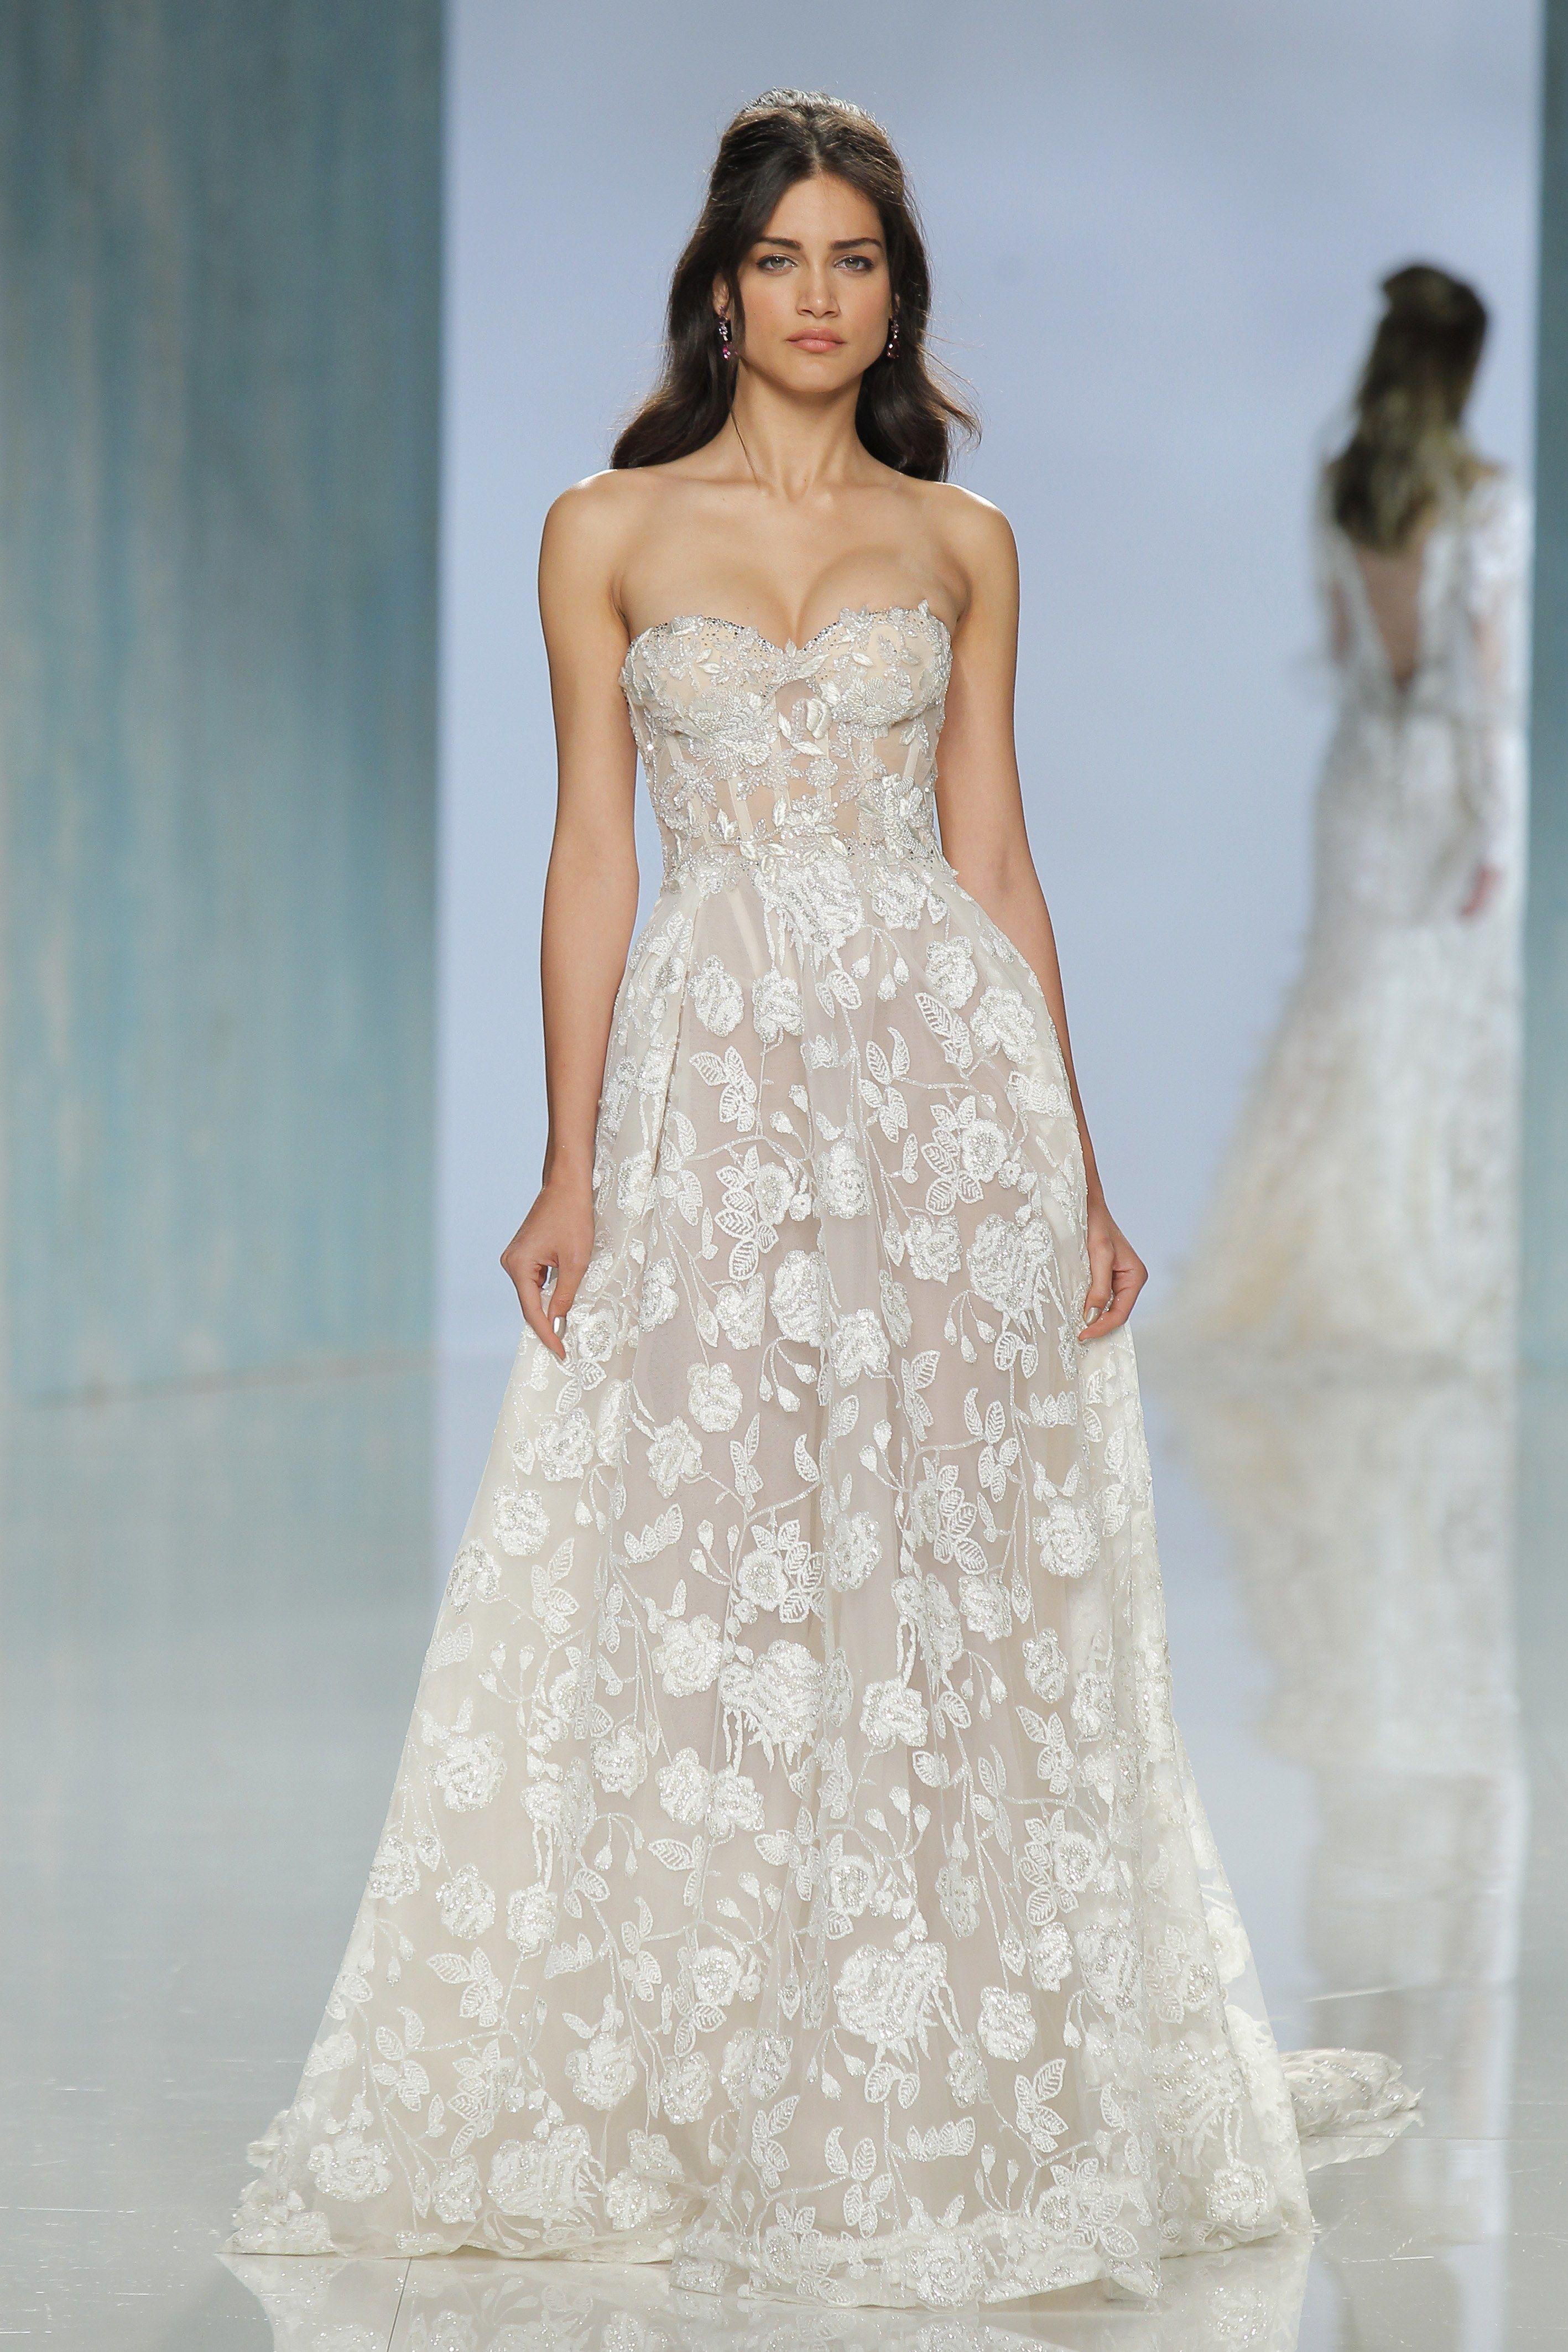 Galia Lahav Bridal Wedding Dress Collection Spring 2018 Brides